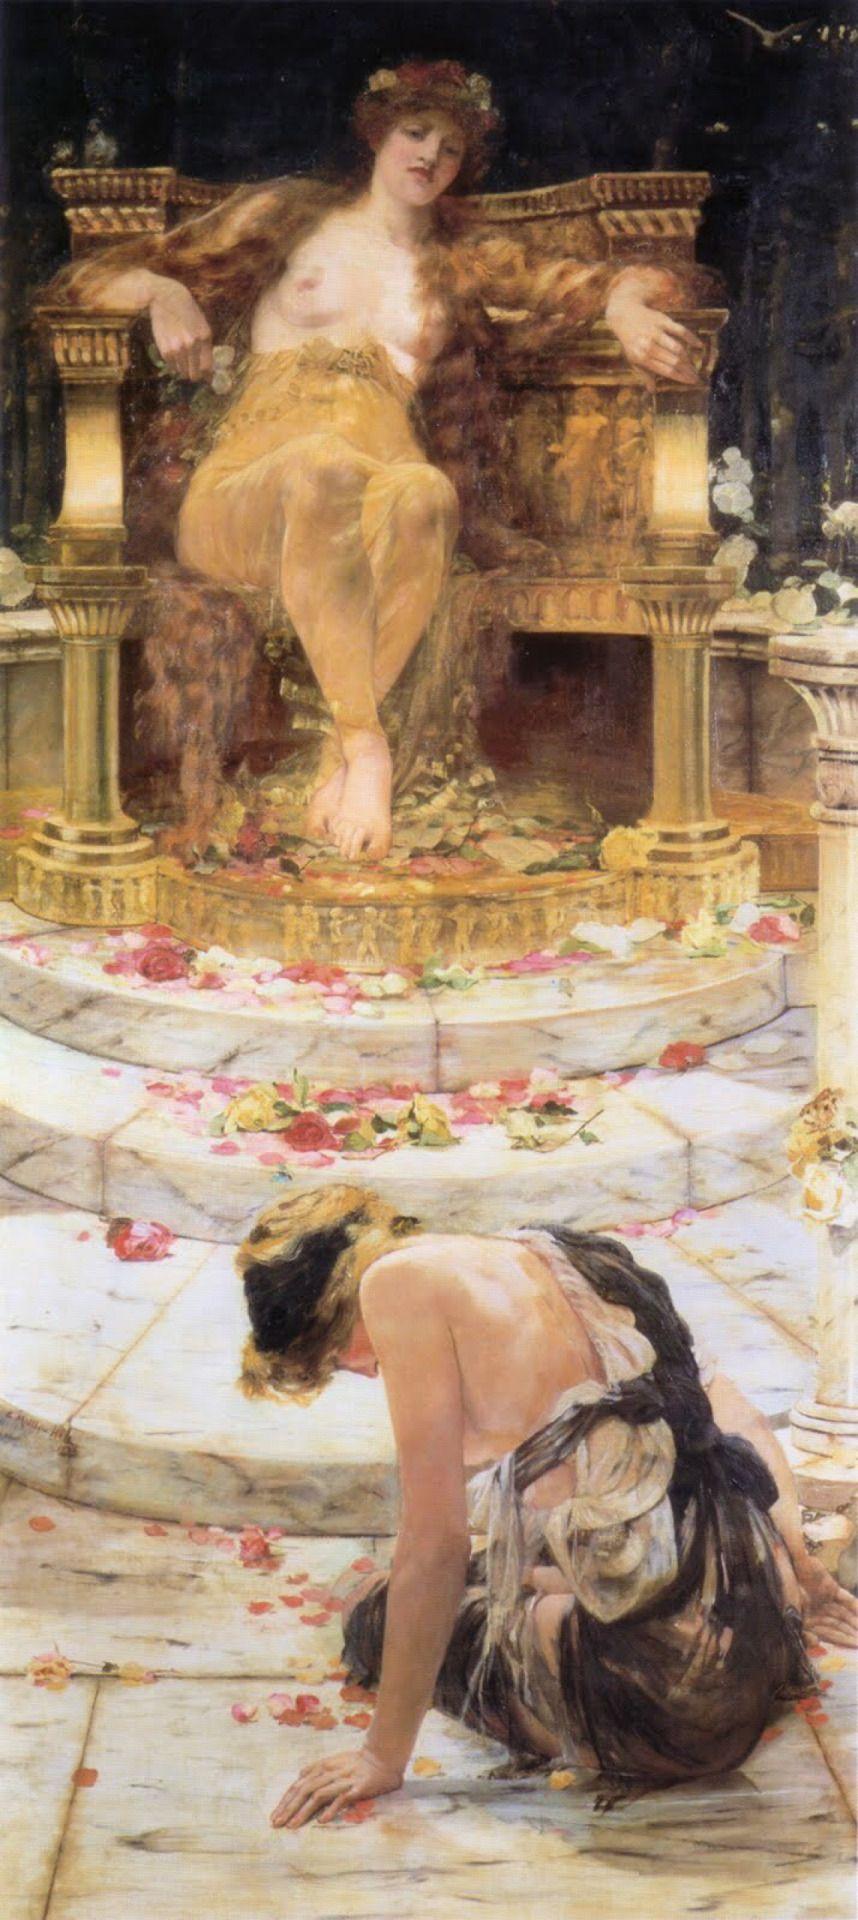 Hale-Psyche-at-Throne-of-Venus-1883-e1551568417354.jpg